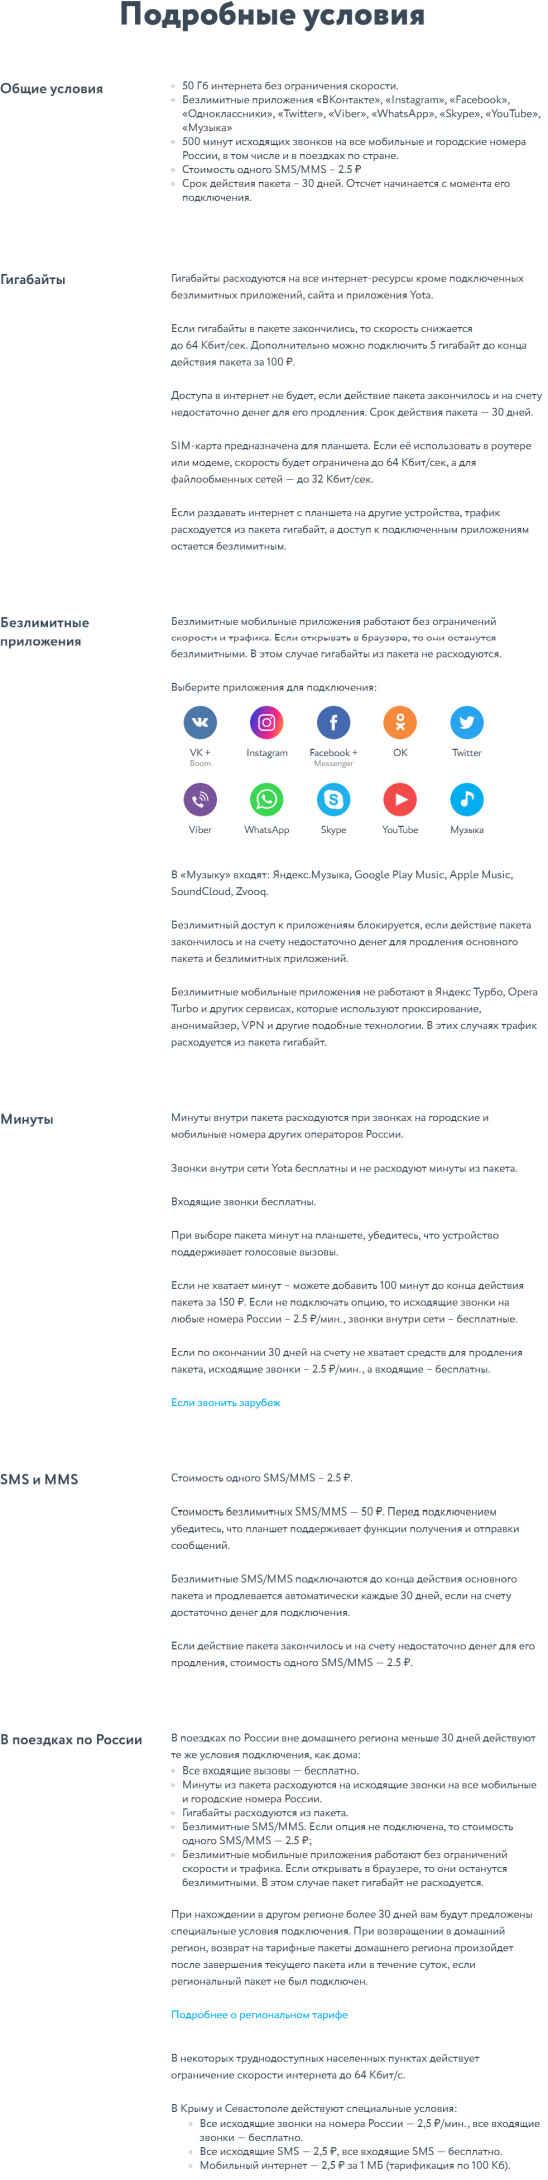 Yota Москва для планшета. Подробно